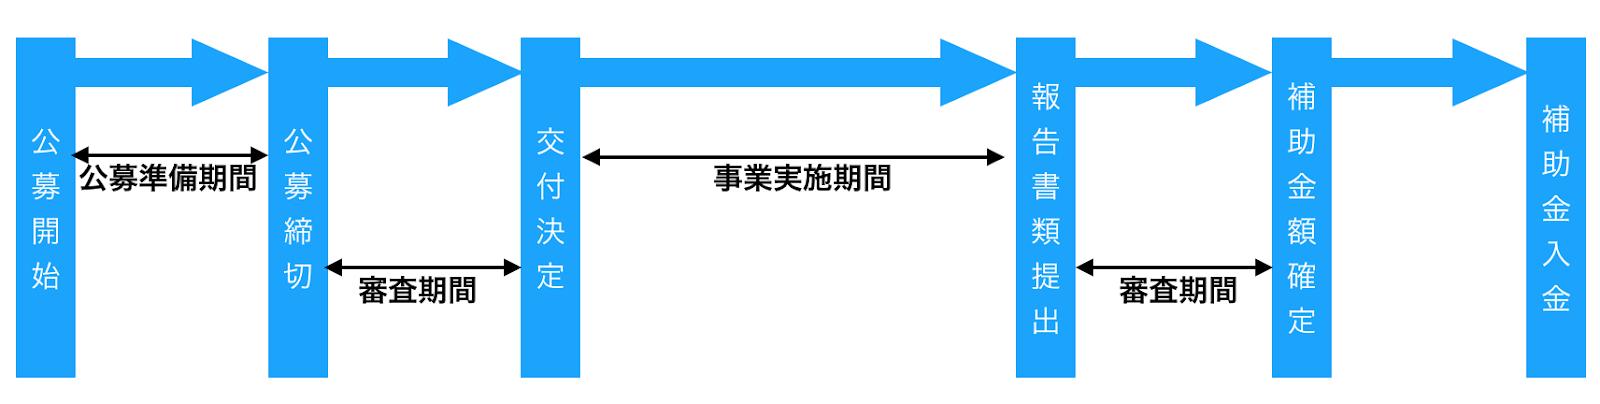 Macintosh HD:Users:takayuki:Desktop:スクリーンショット 2018-10-24 15.20.58.png